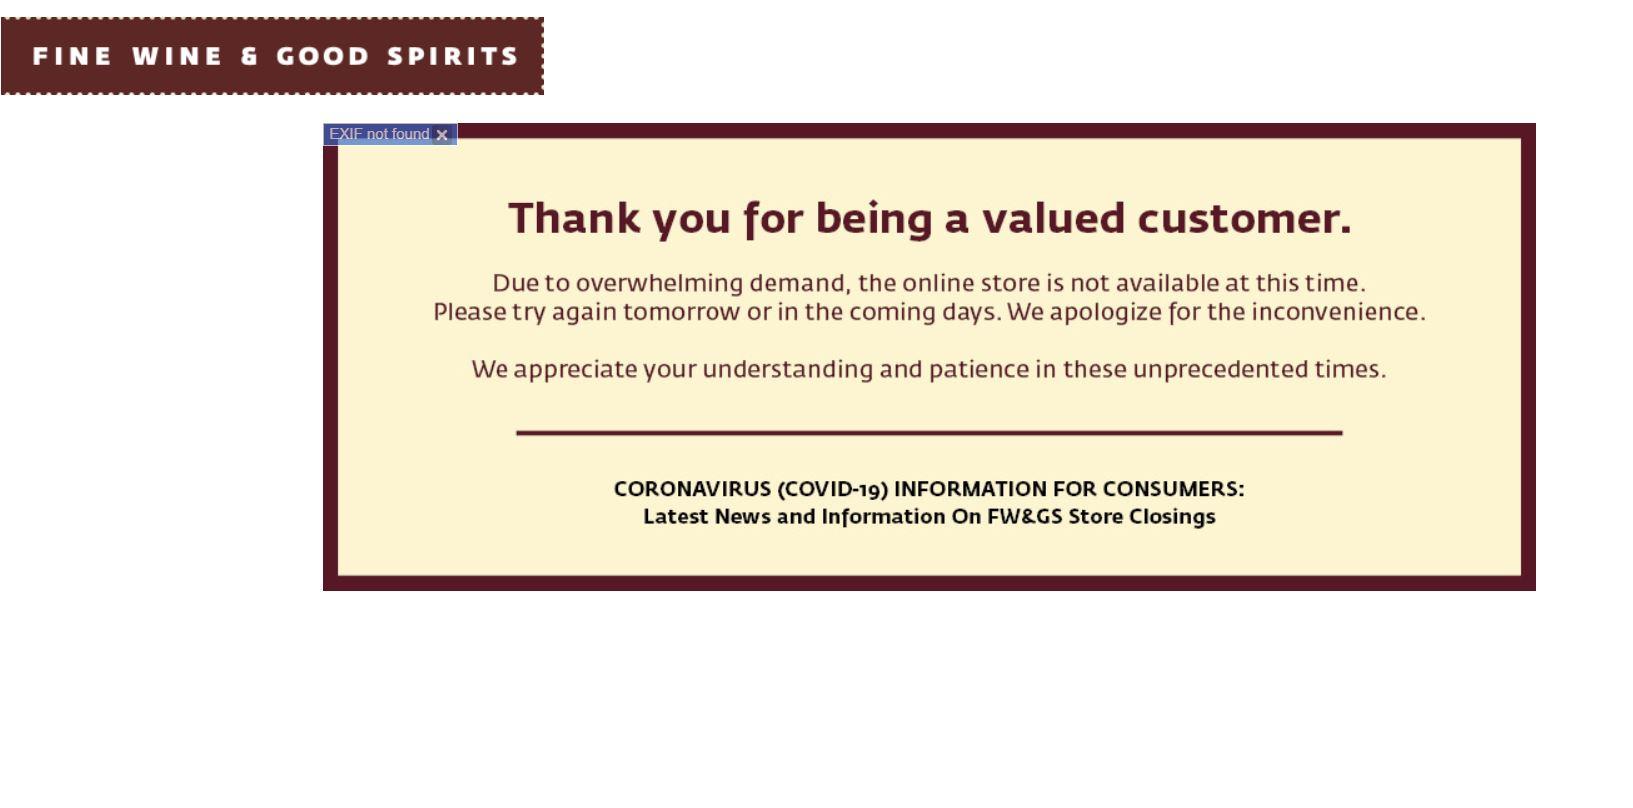 Pa. Liquor Stores Restart Online Sales But Throttle on Site Means Few Get Through